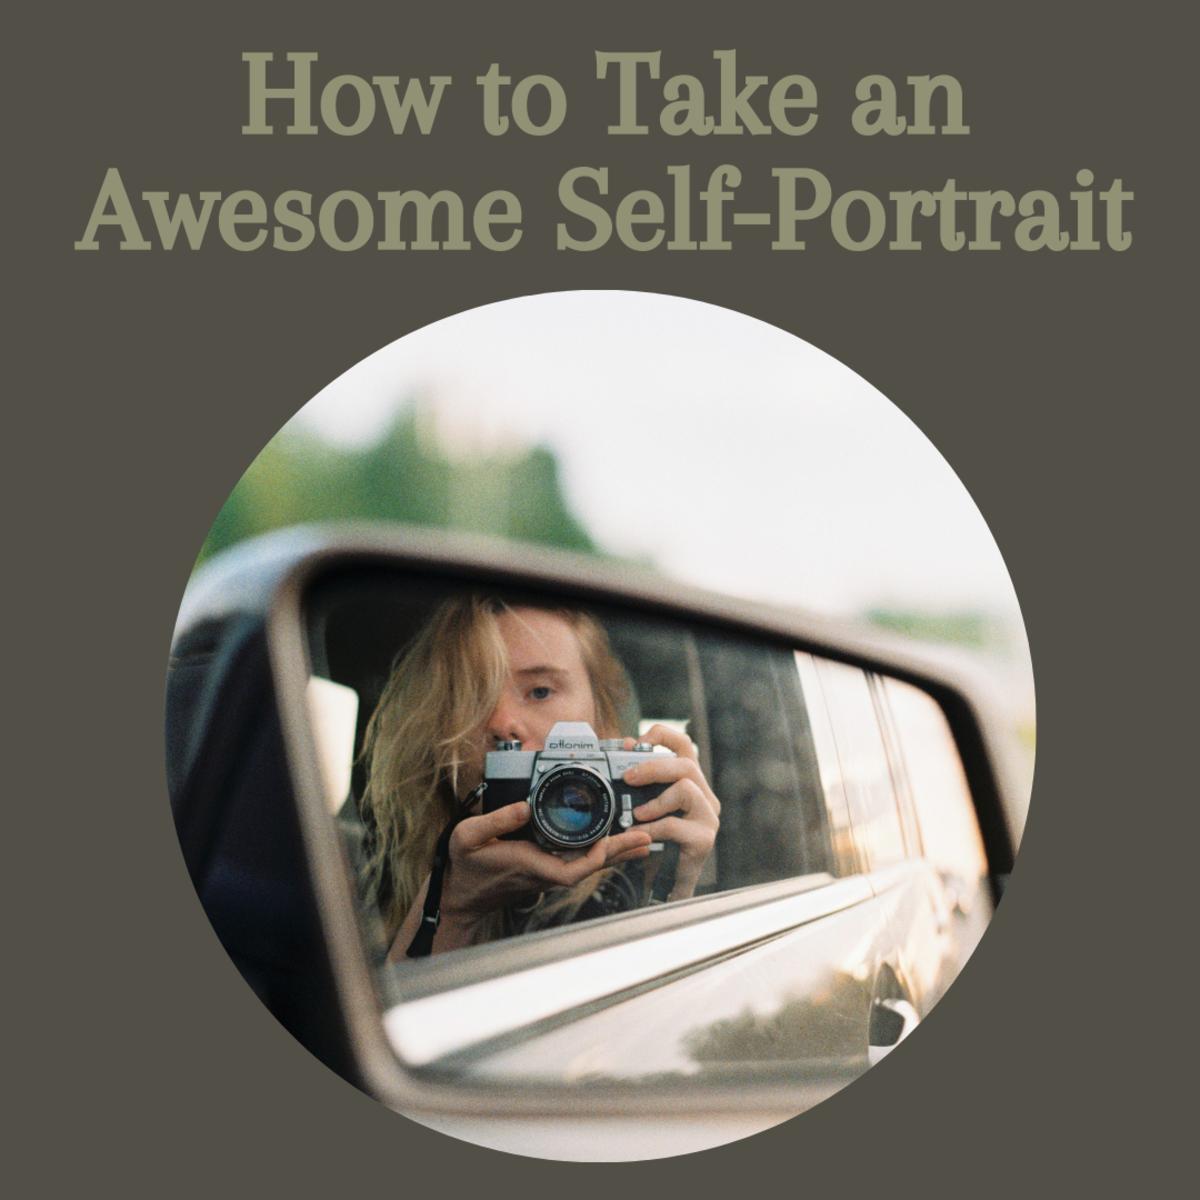 How to take a self-portrait